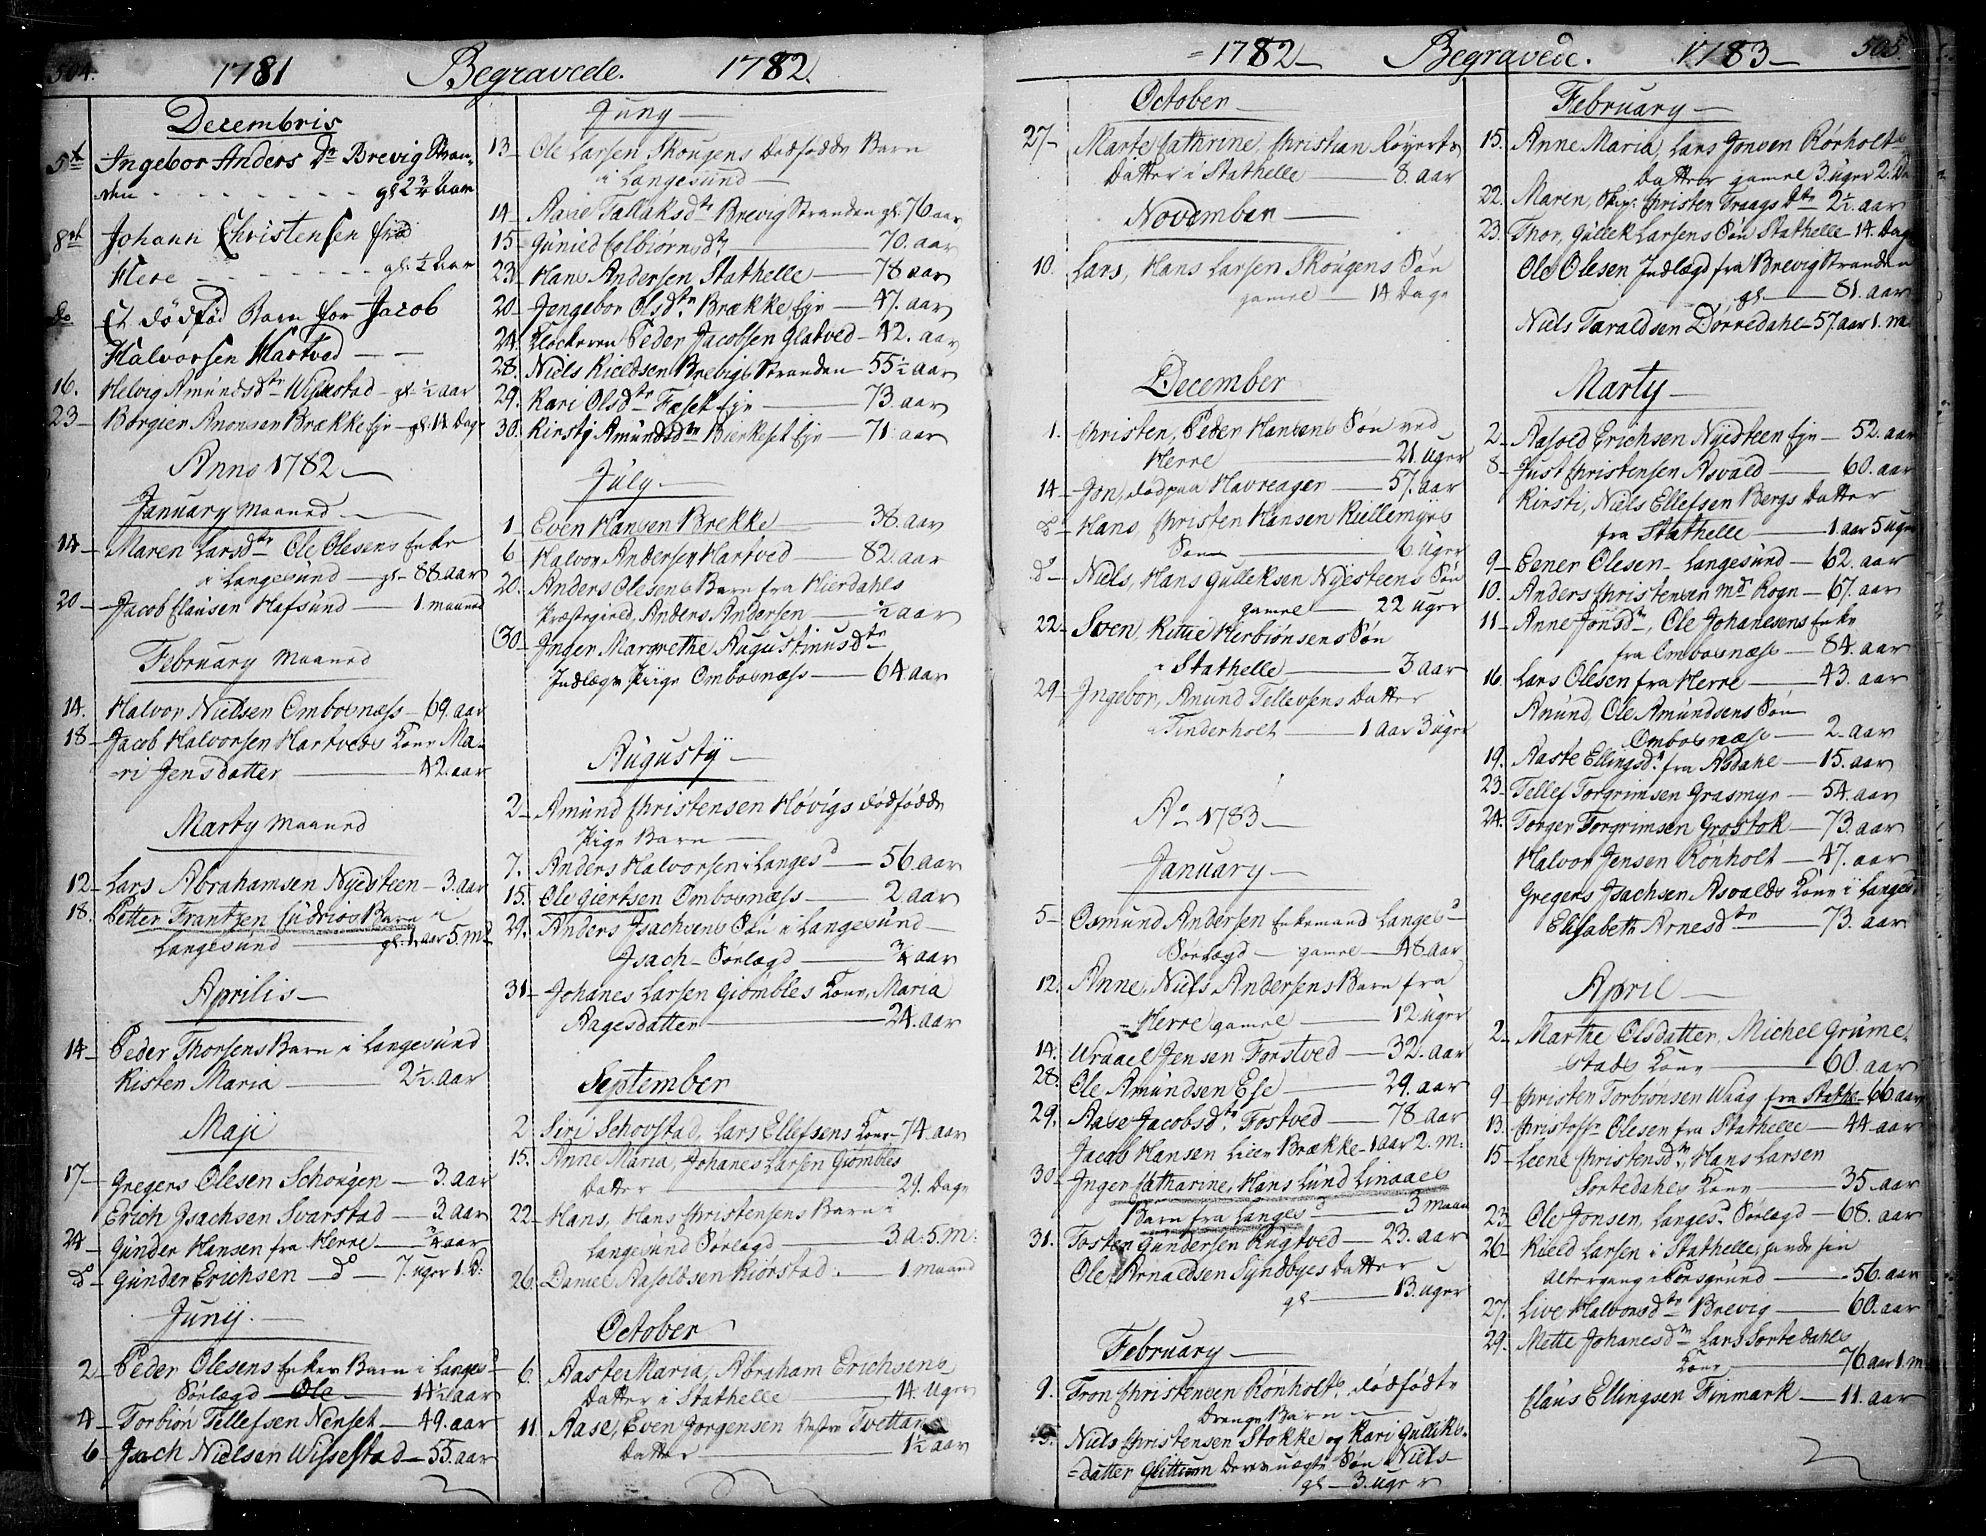 SAKO, Bamble kirkebøker, F/Fa/L0002: Ministerialbok nr. I 2, 1775-1814, s. 504-505